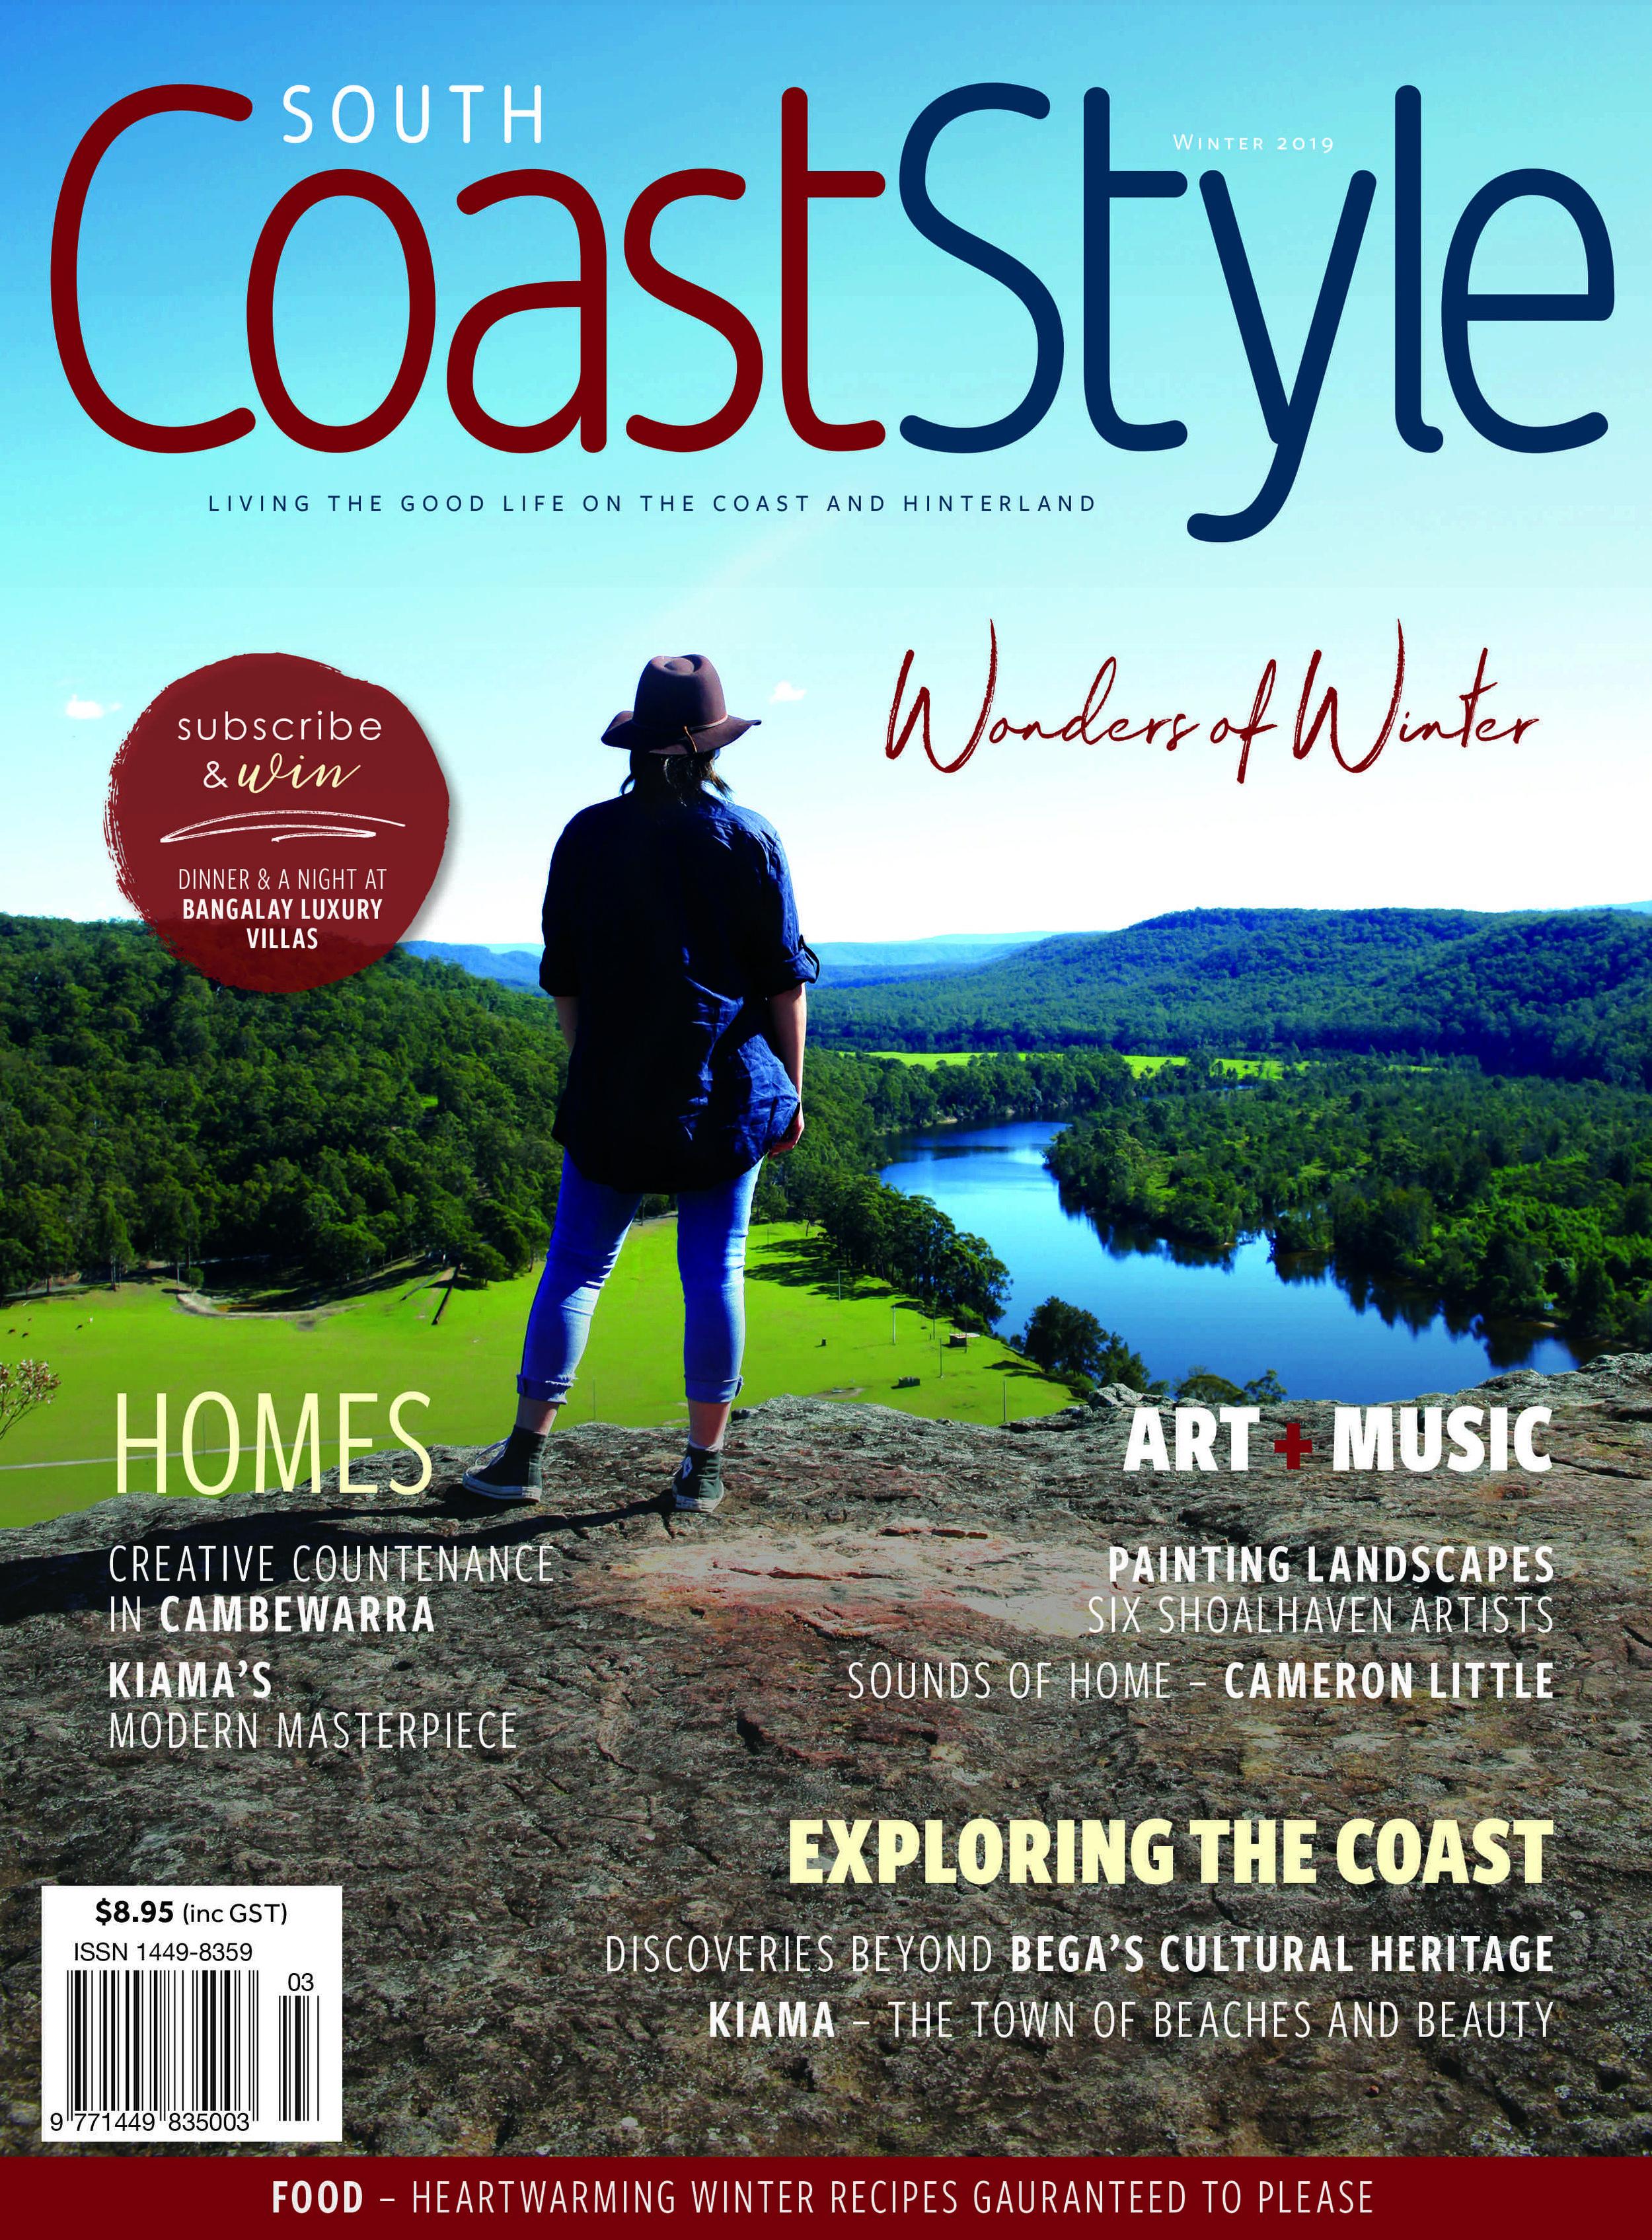 South Coast Magazine Winter Edition.jpg